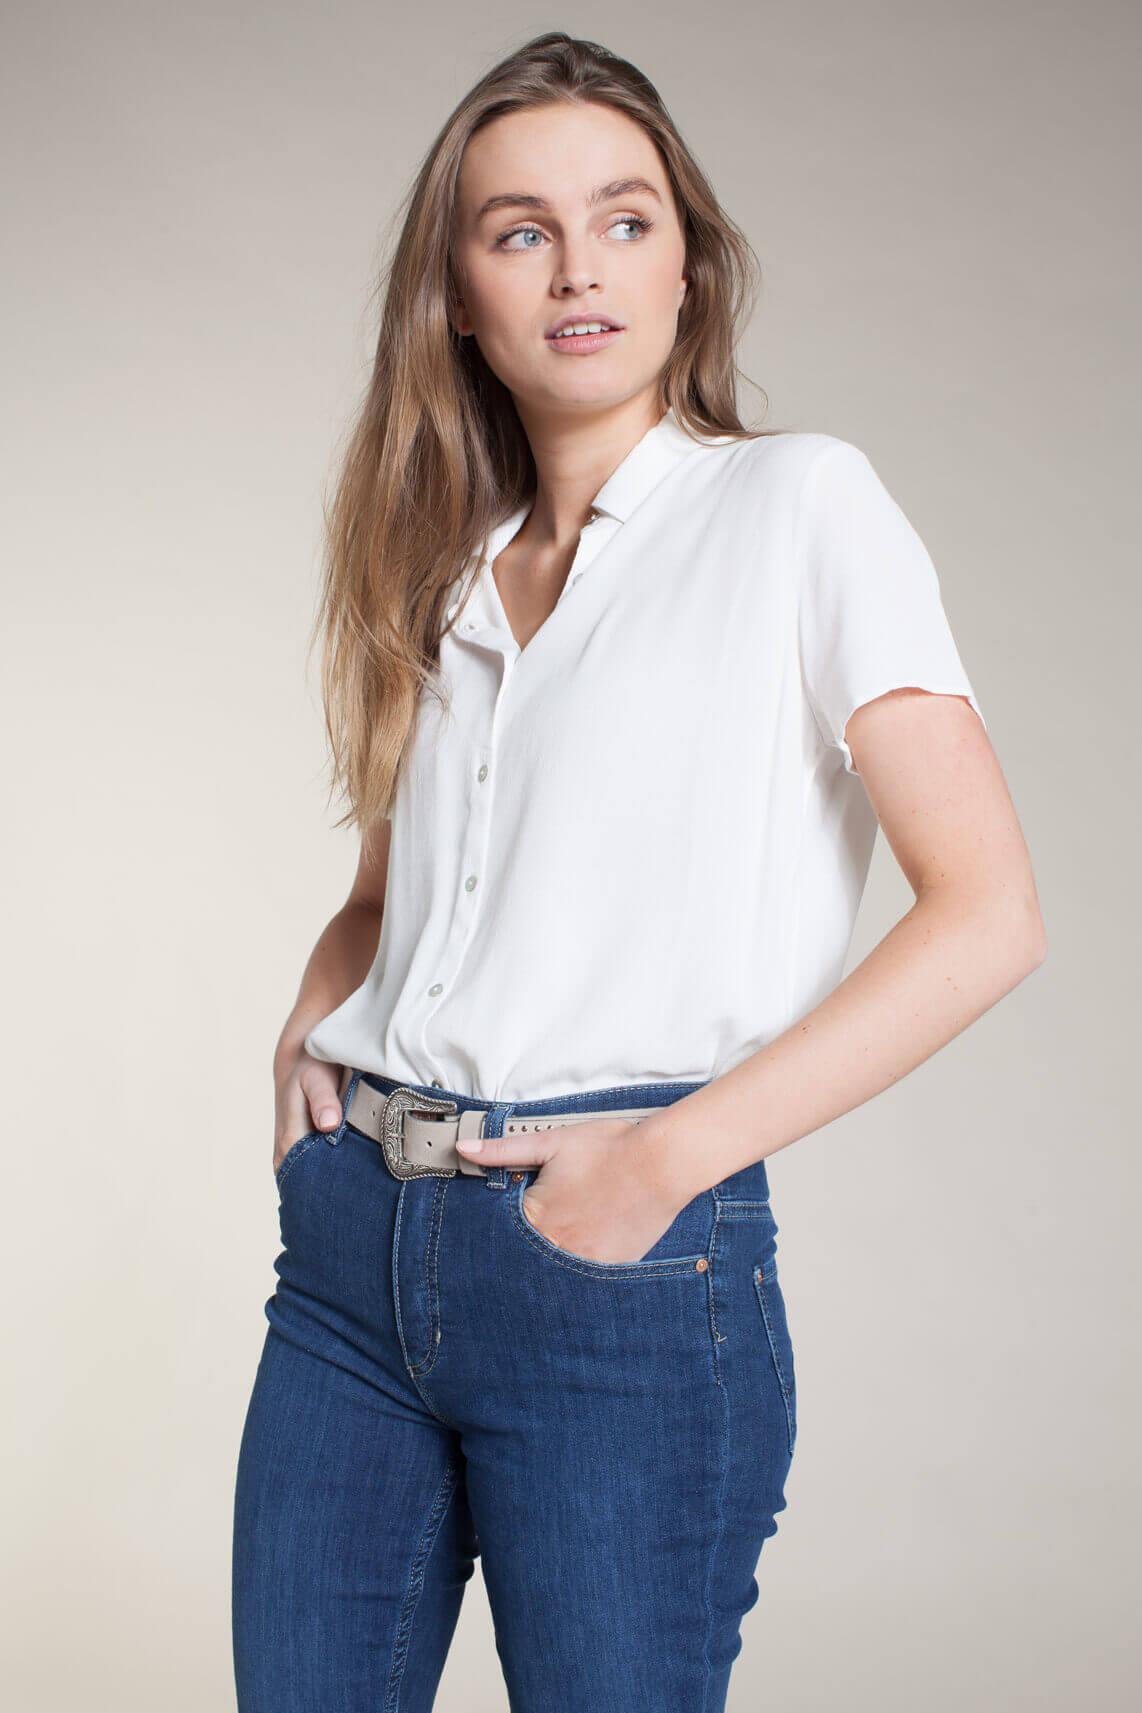 Anna Dames Blouse met korte mouw wit